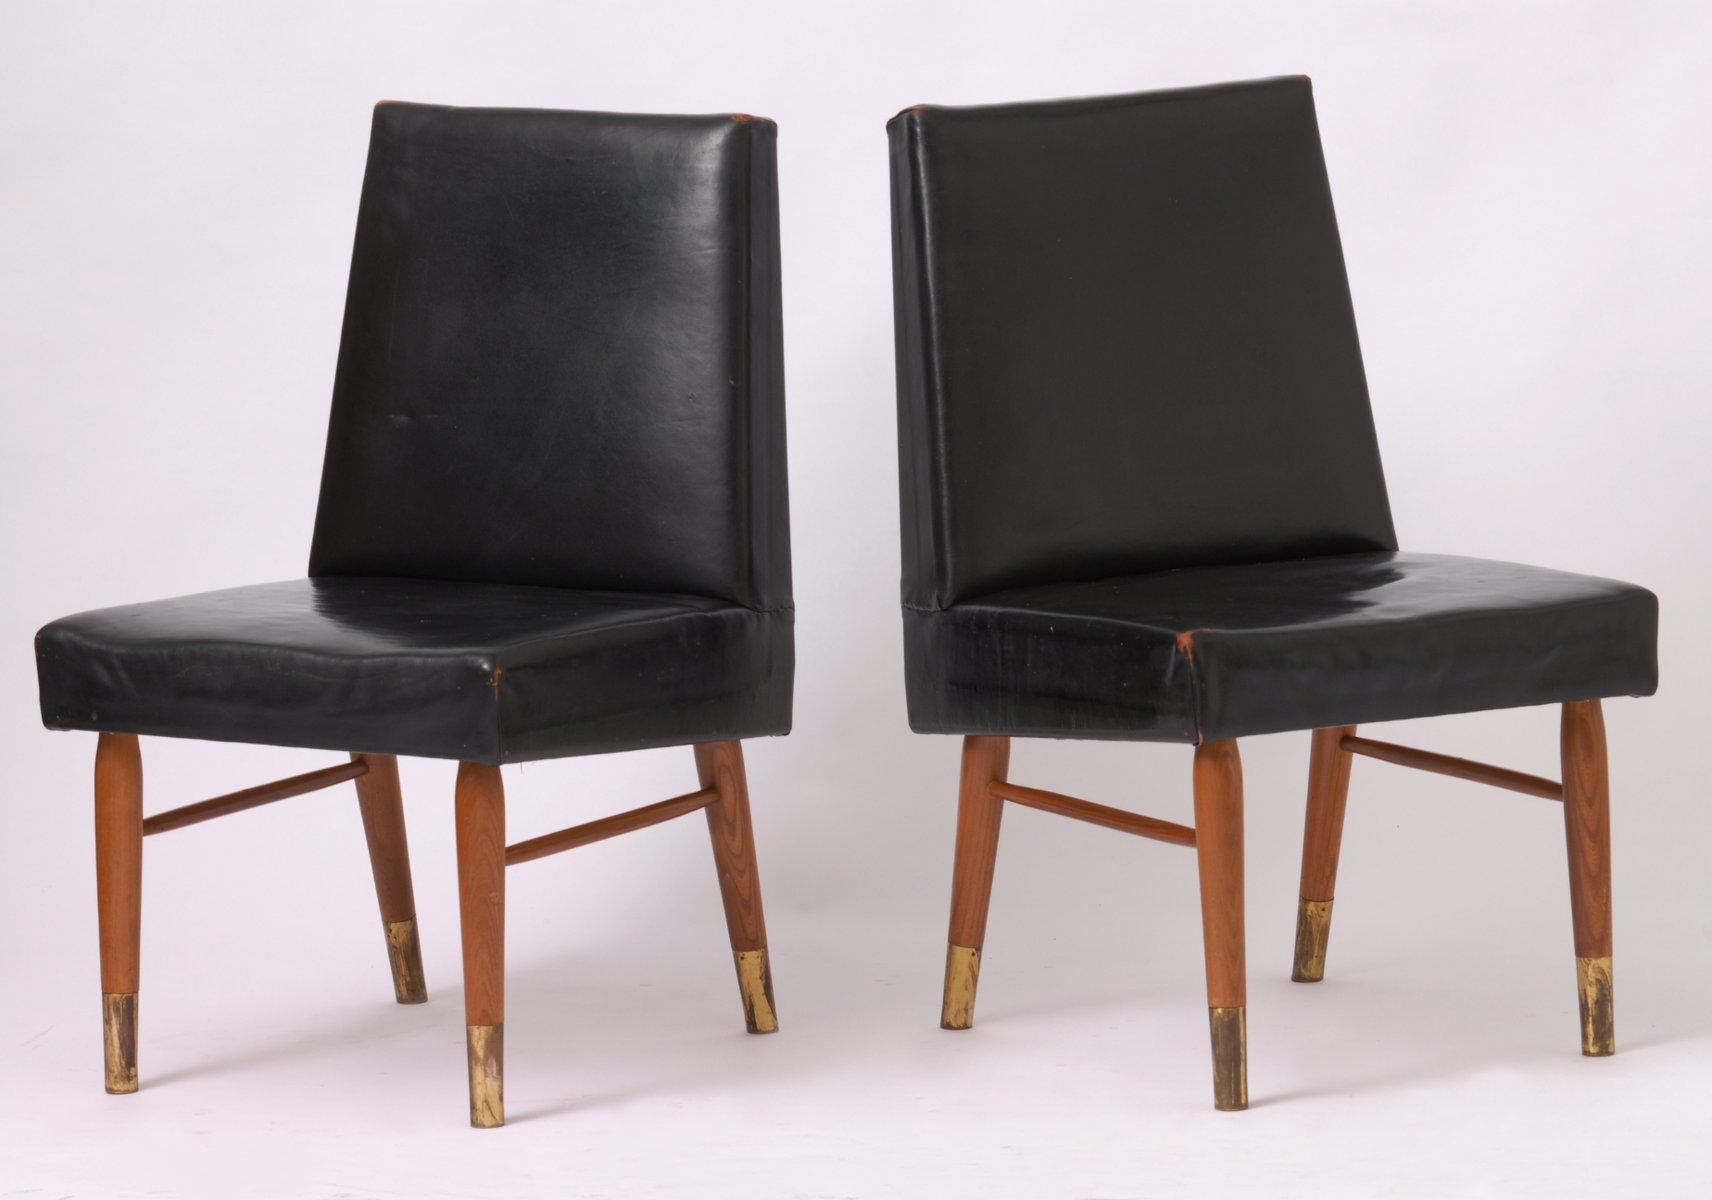 Sedie vintage in pelle nera, set di 2 in vendita su Pamono